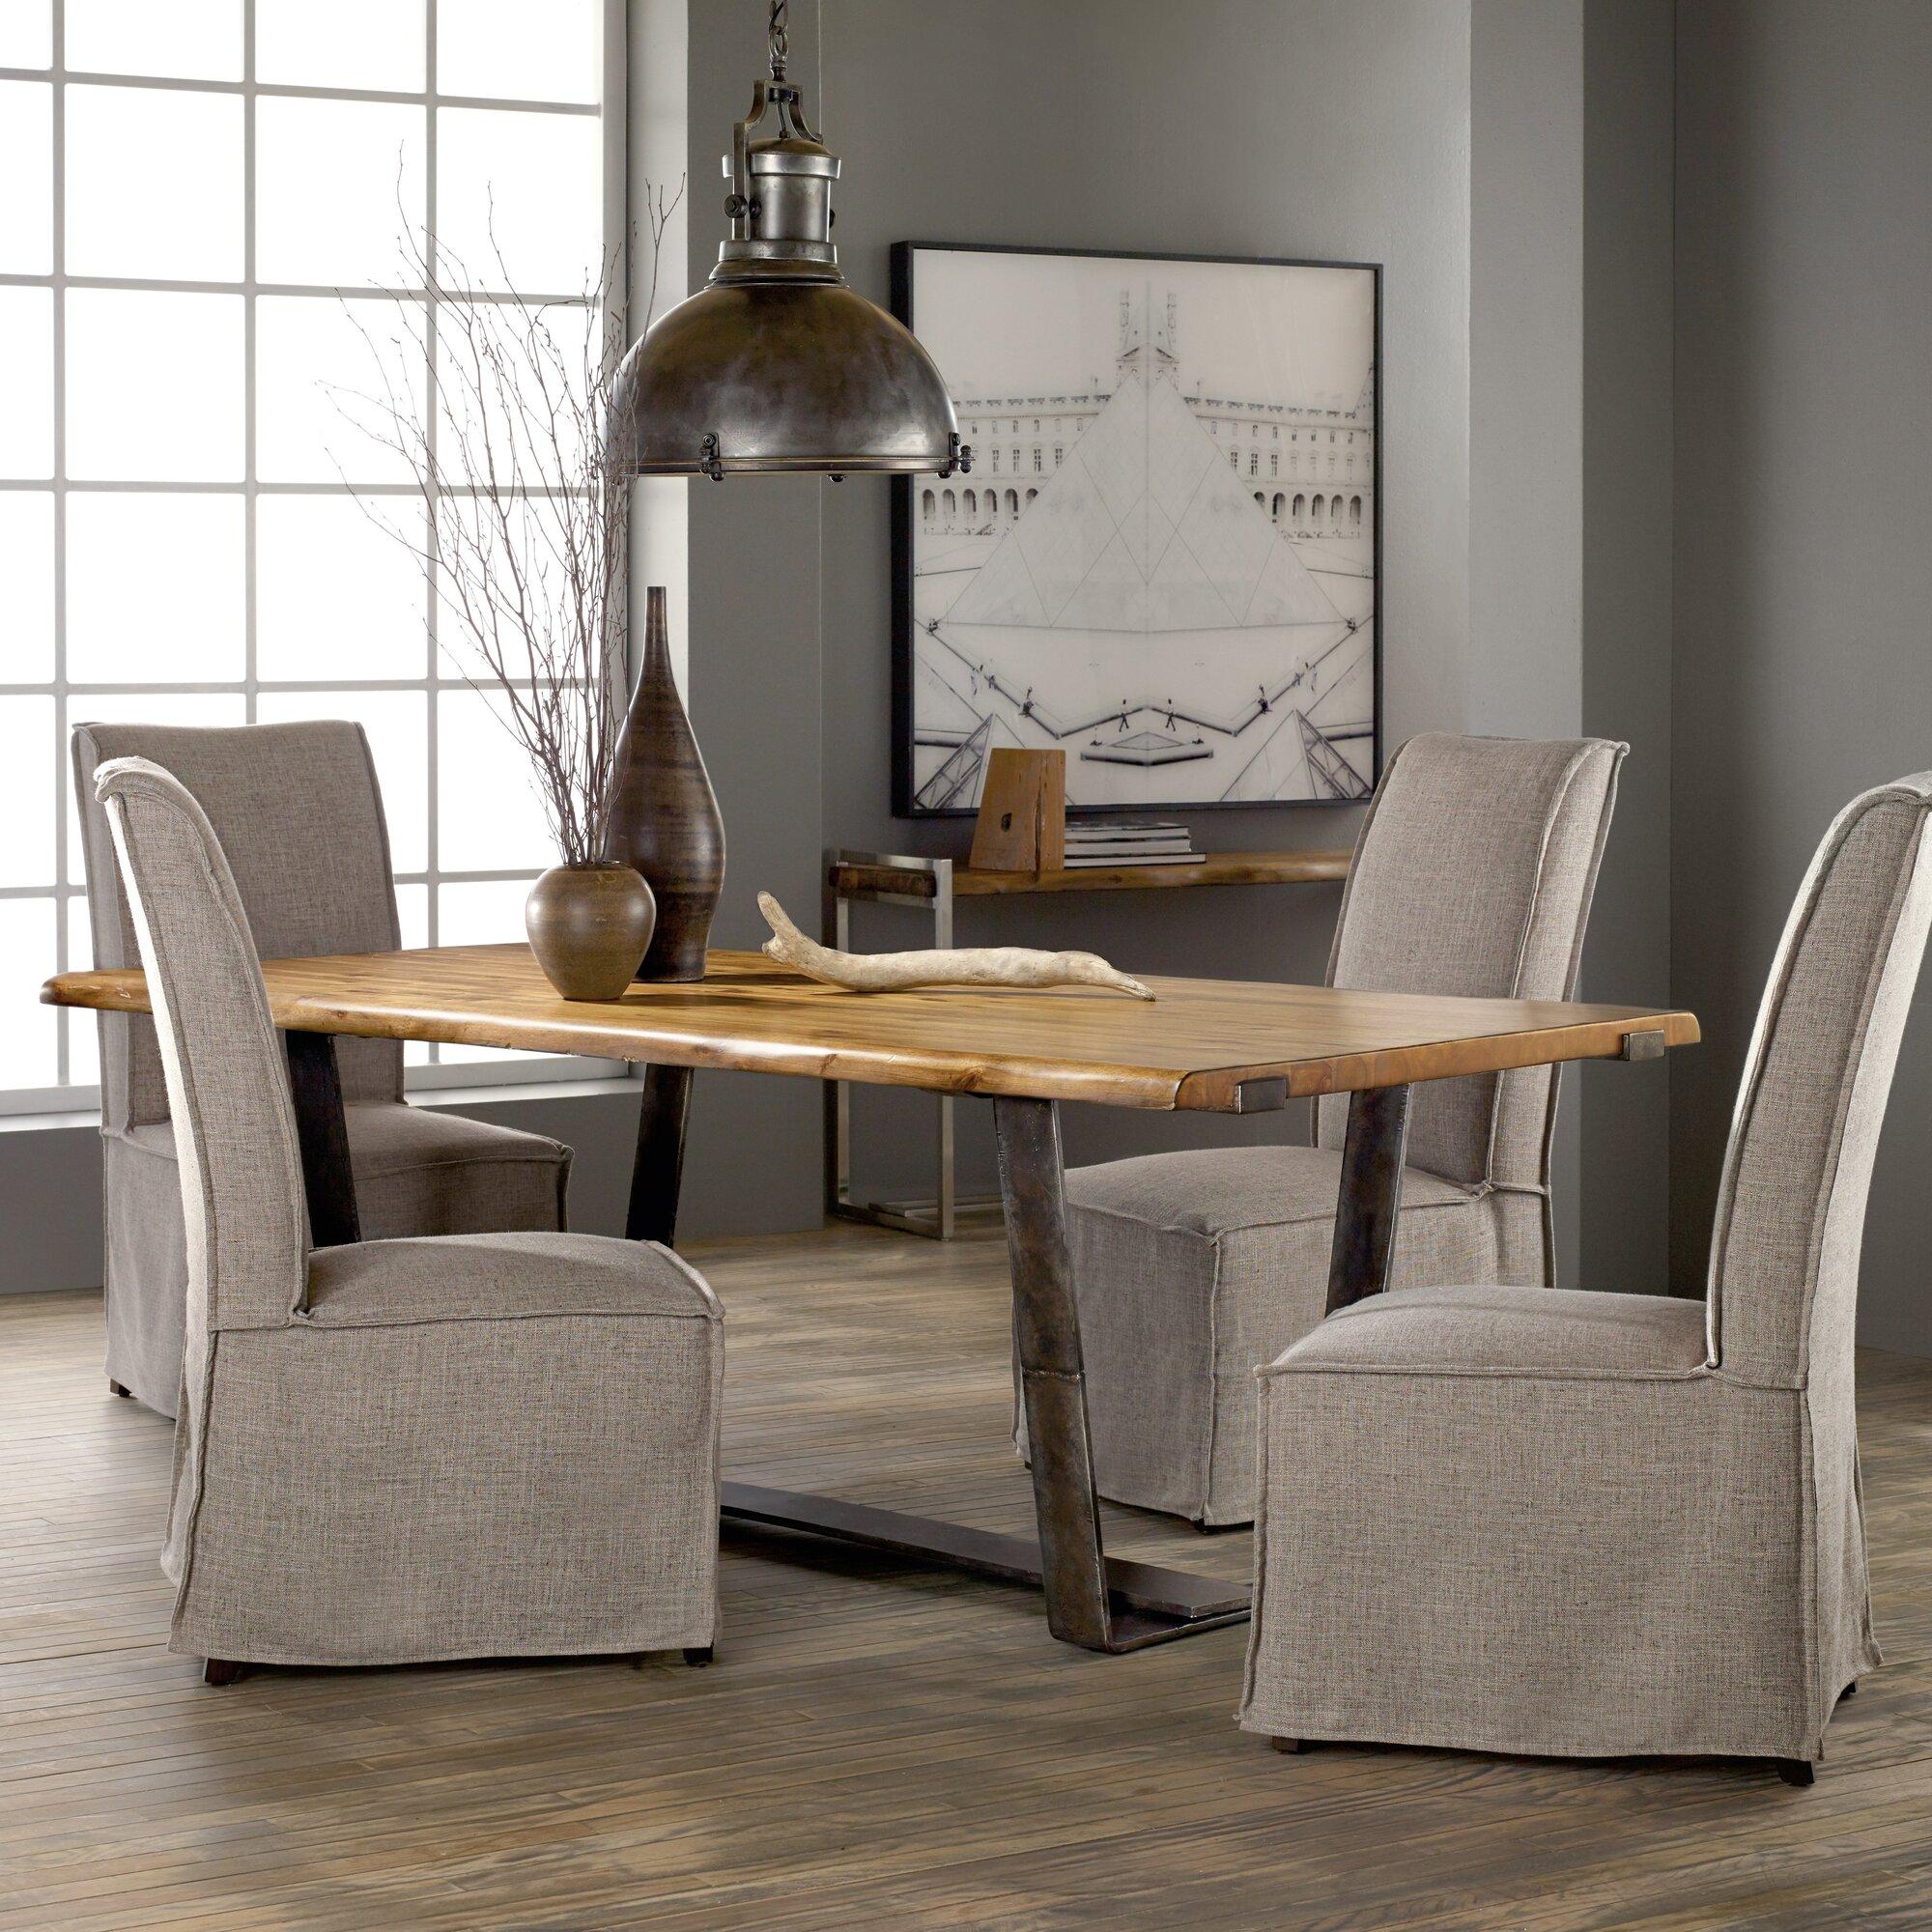 Hooker Furniture Live Edge Dining Table & Reviews | Wayfair